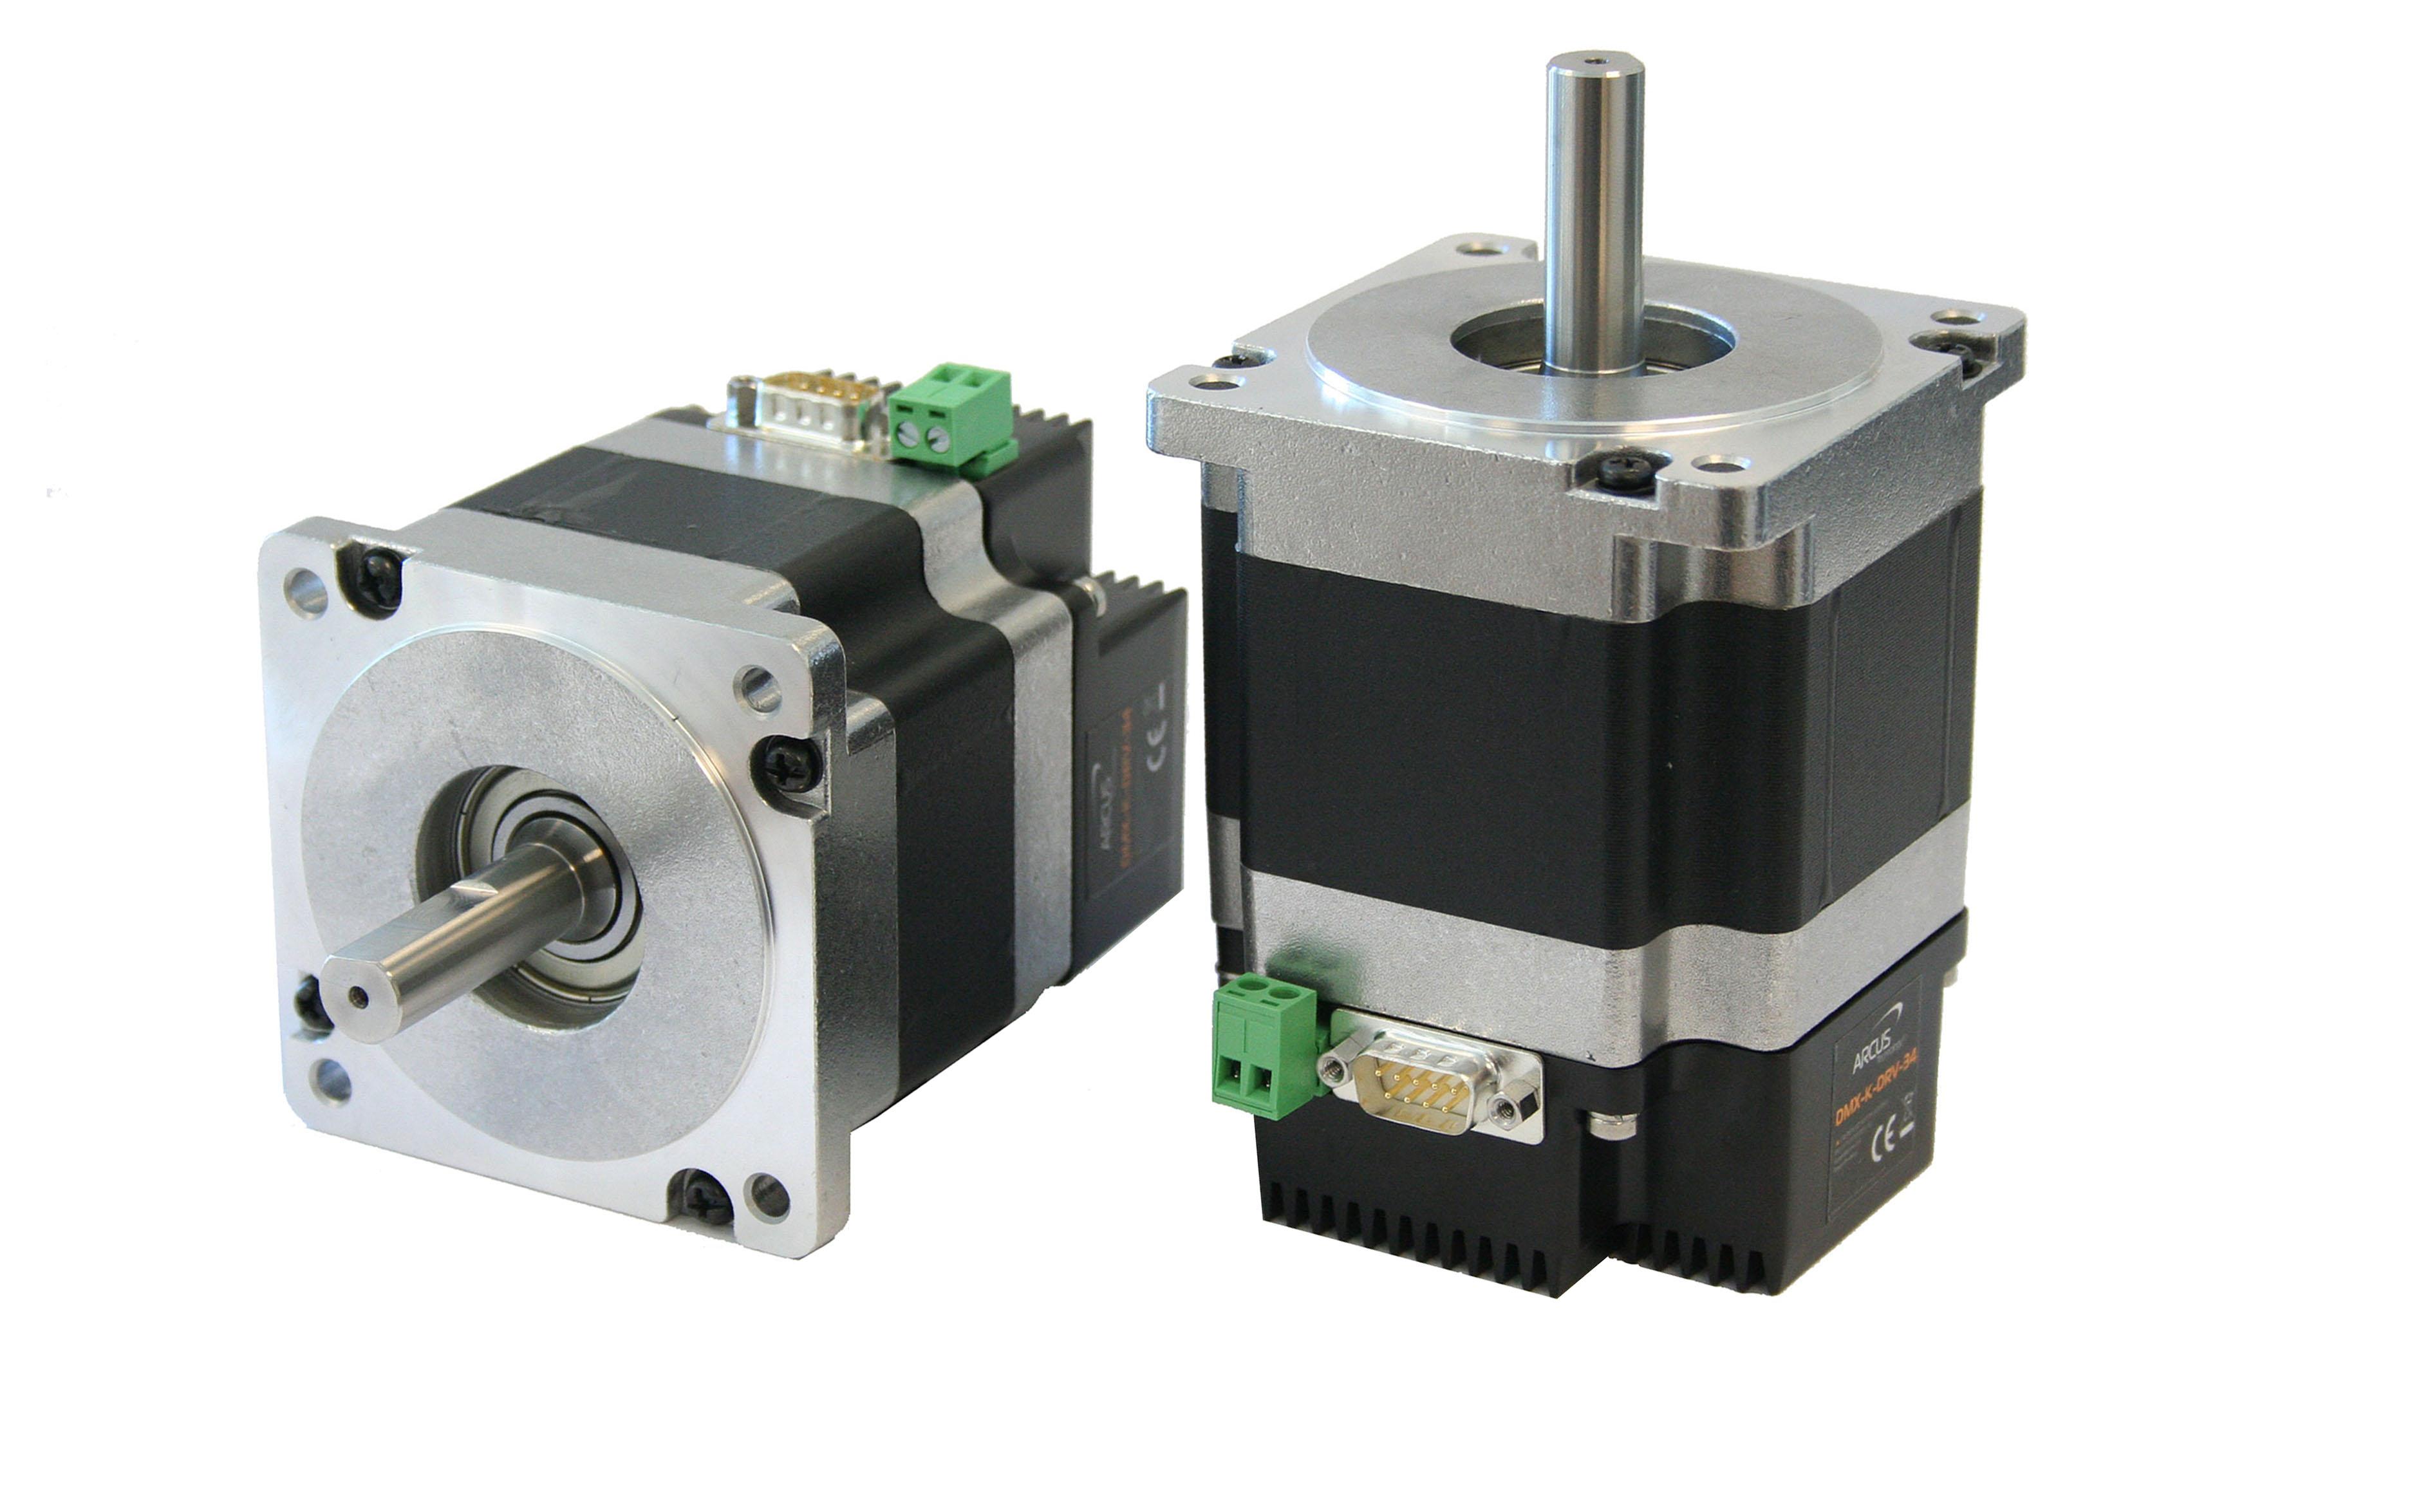 Nema 34 stepper driver arcus technology inc for Stepper motor integrated controller